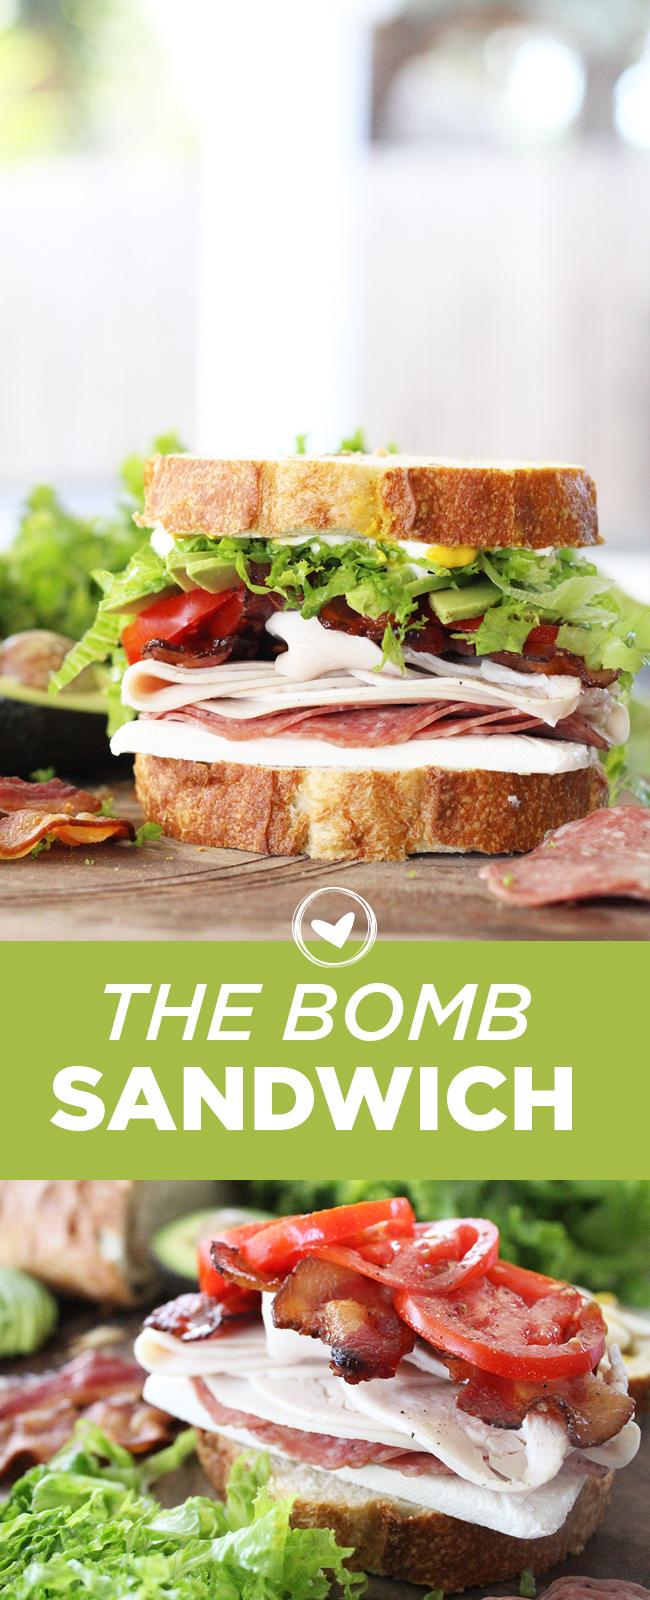 The Bomb Sandwich